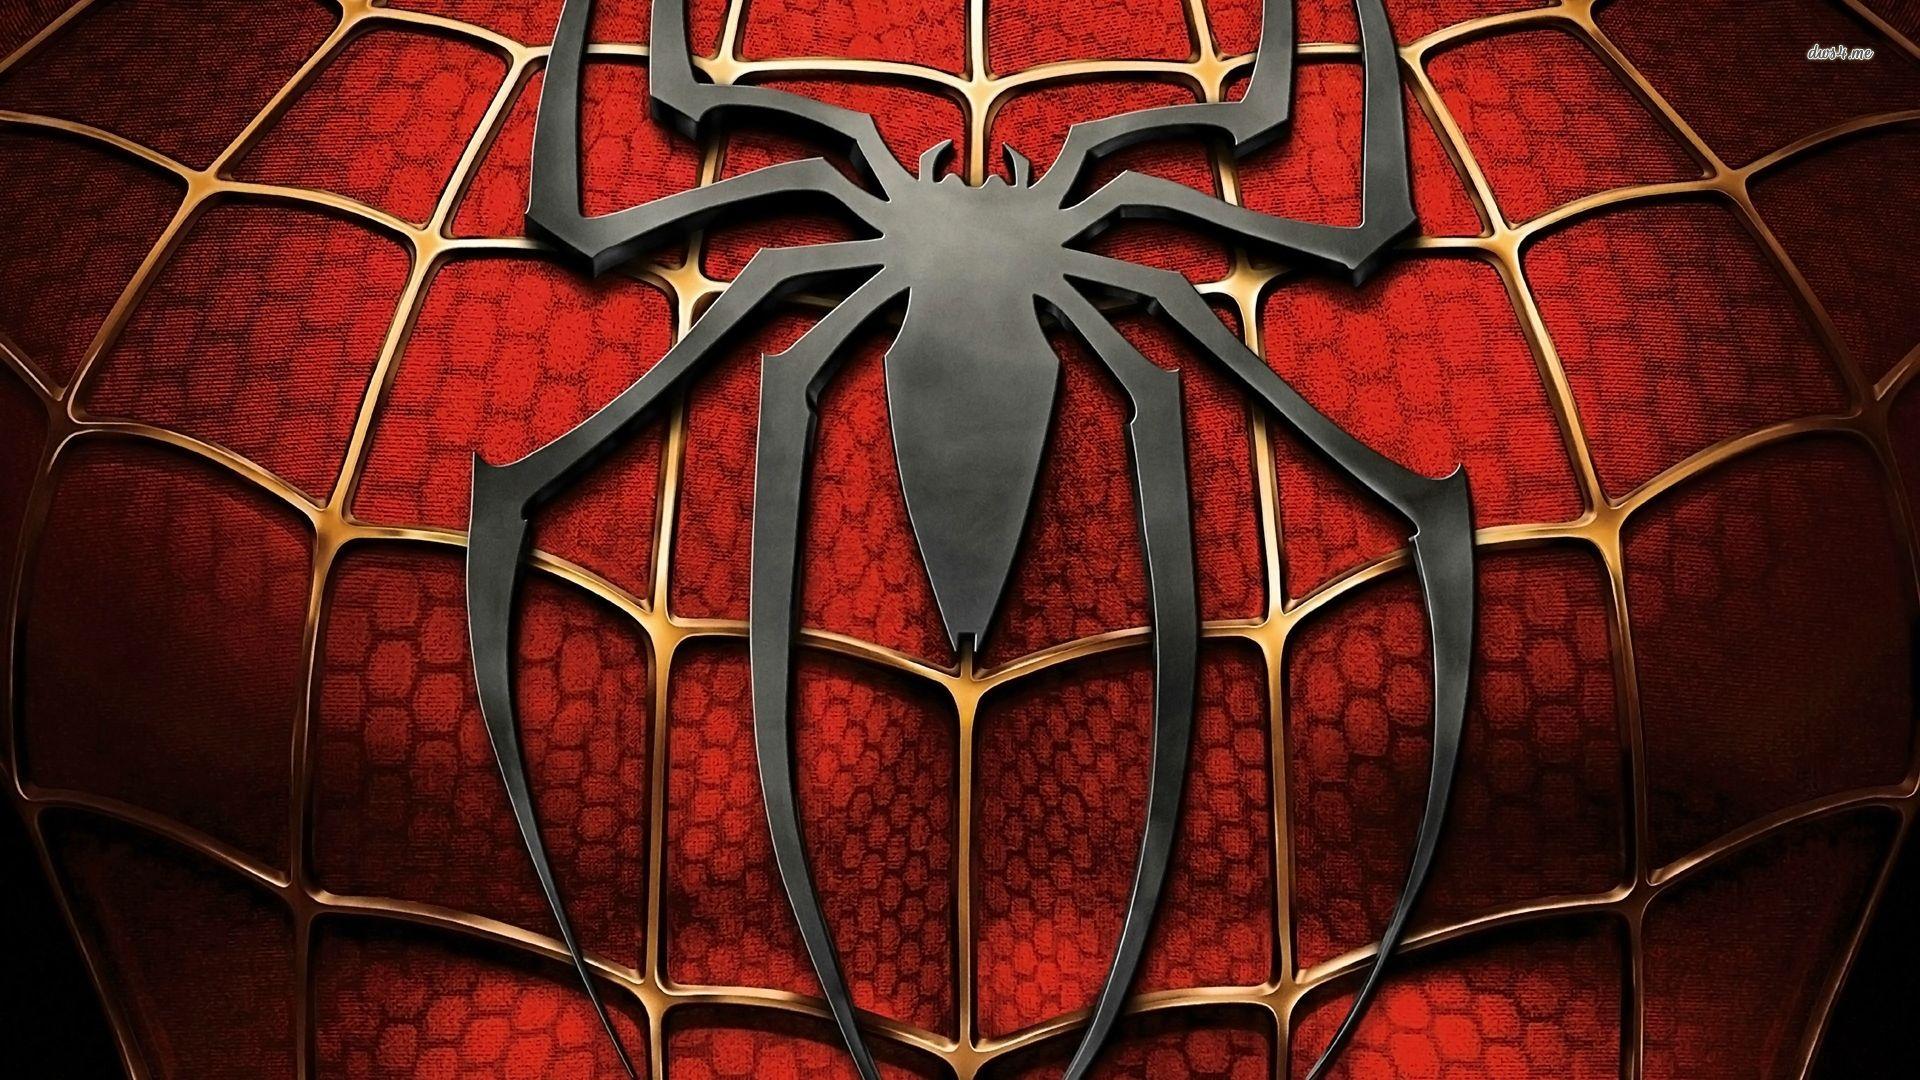 amazing spider man wallpaper hd 1920×1080 the amazing spider man 2